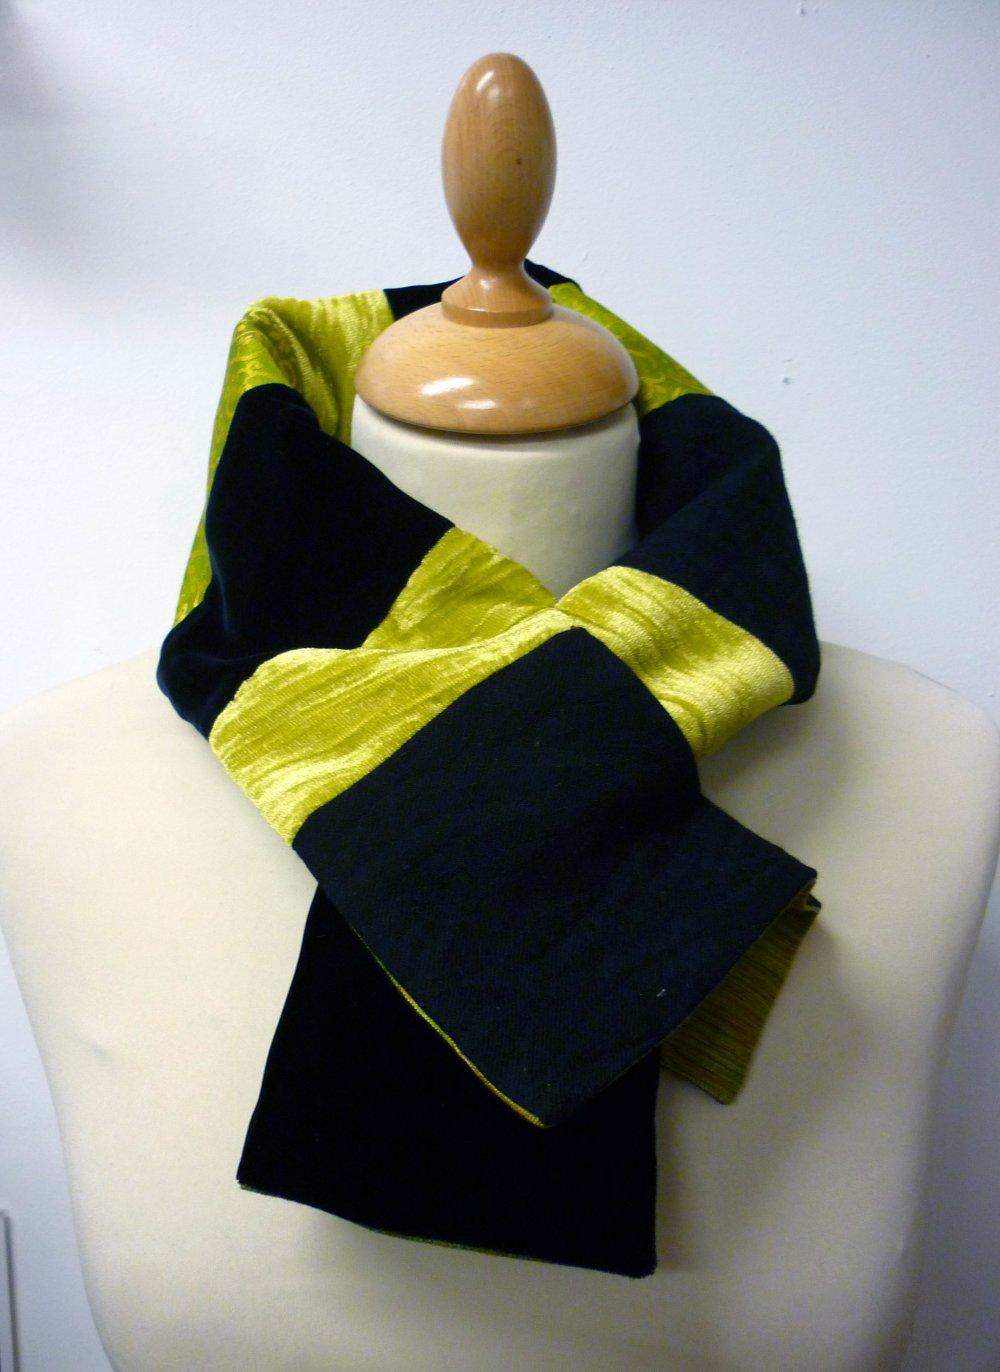 Col-écharpe en patchwork de tissus noir et vert anis